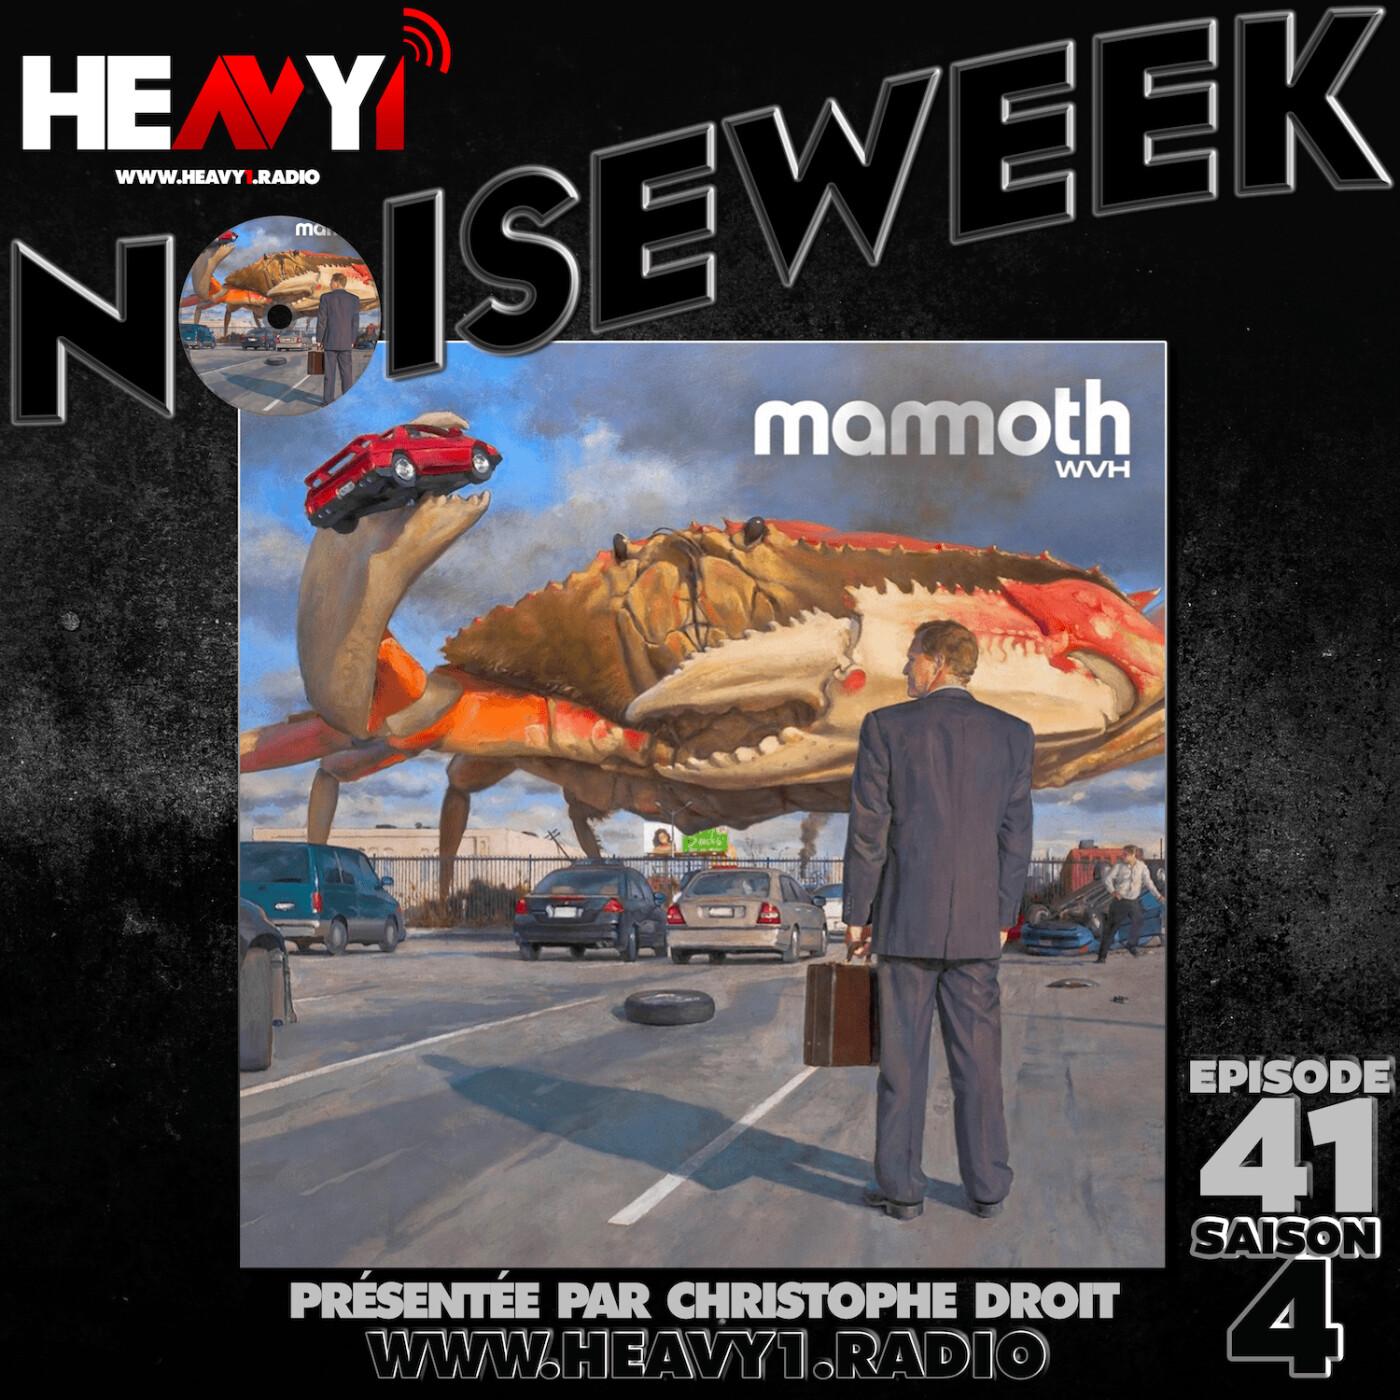 Noiseweek #41 Saison 4